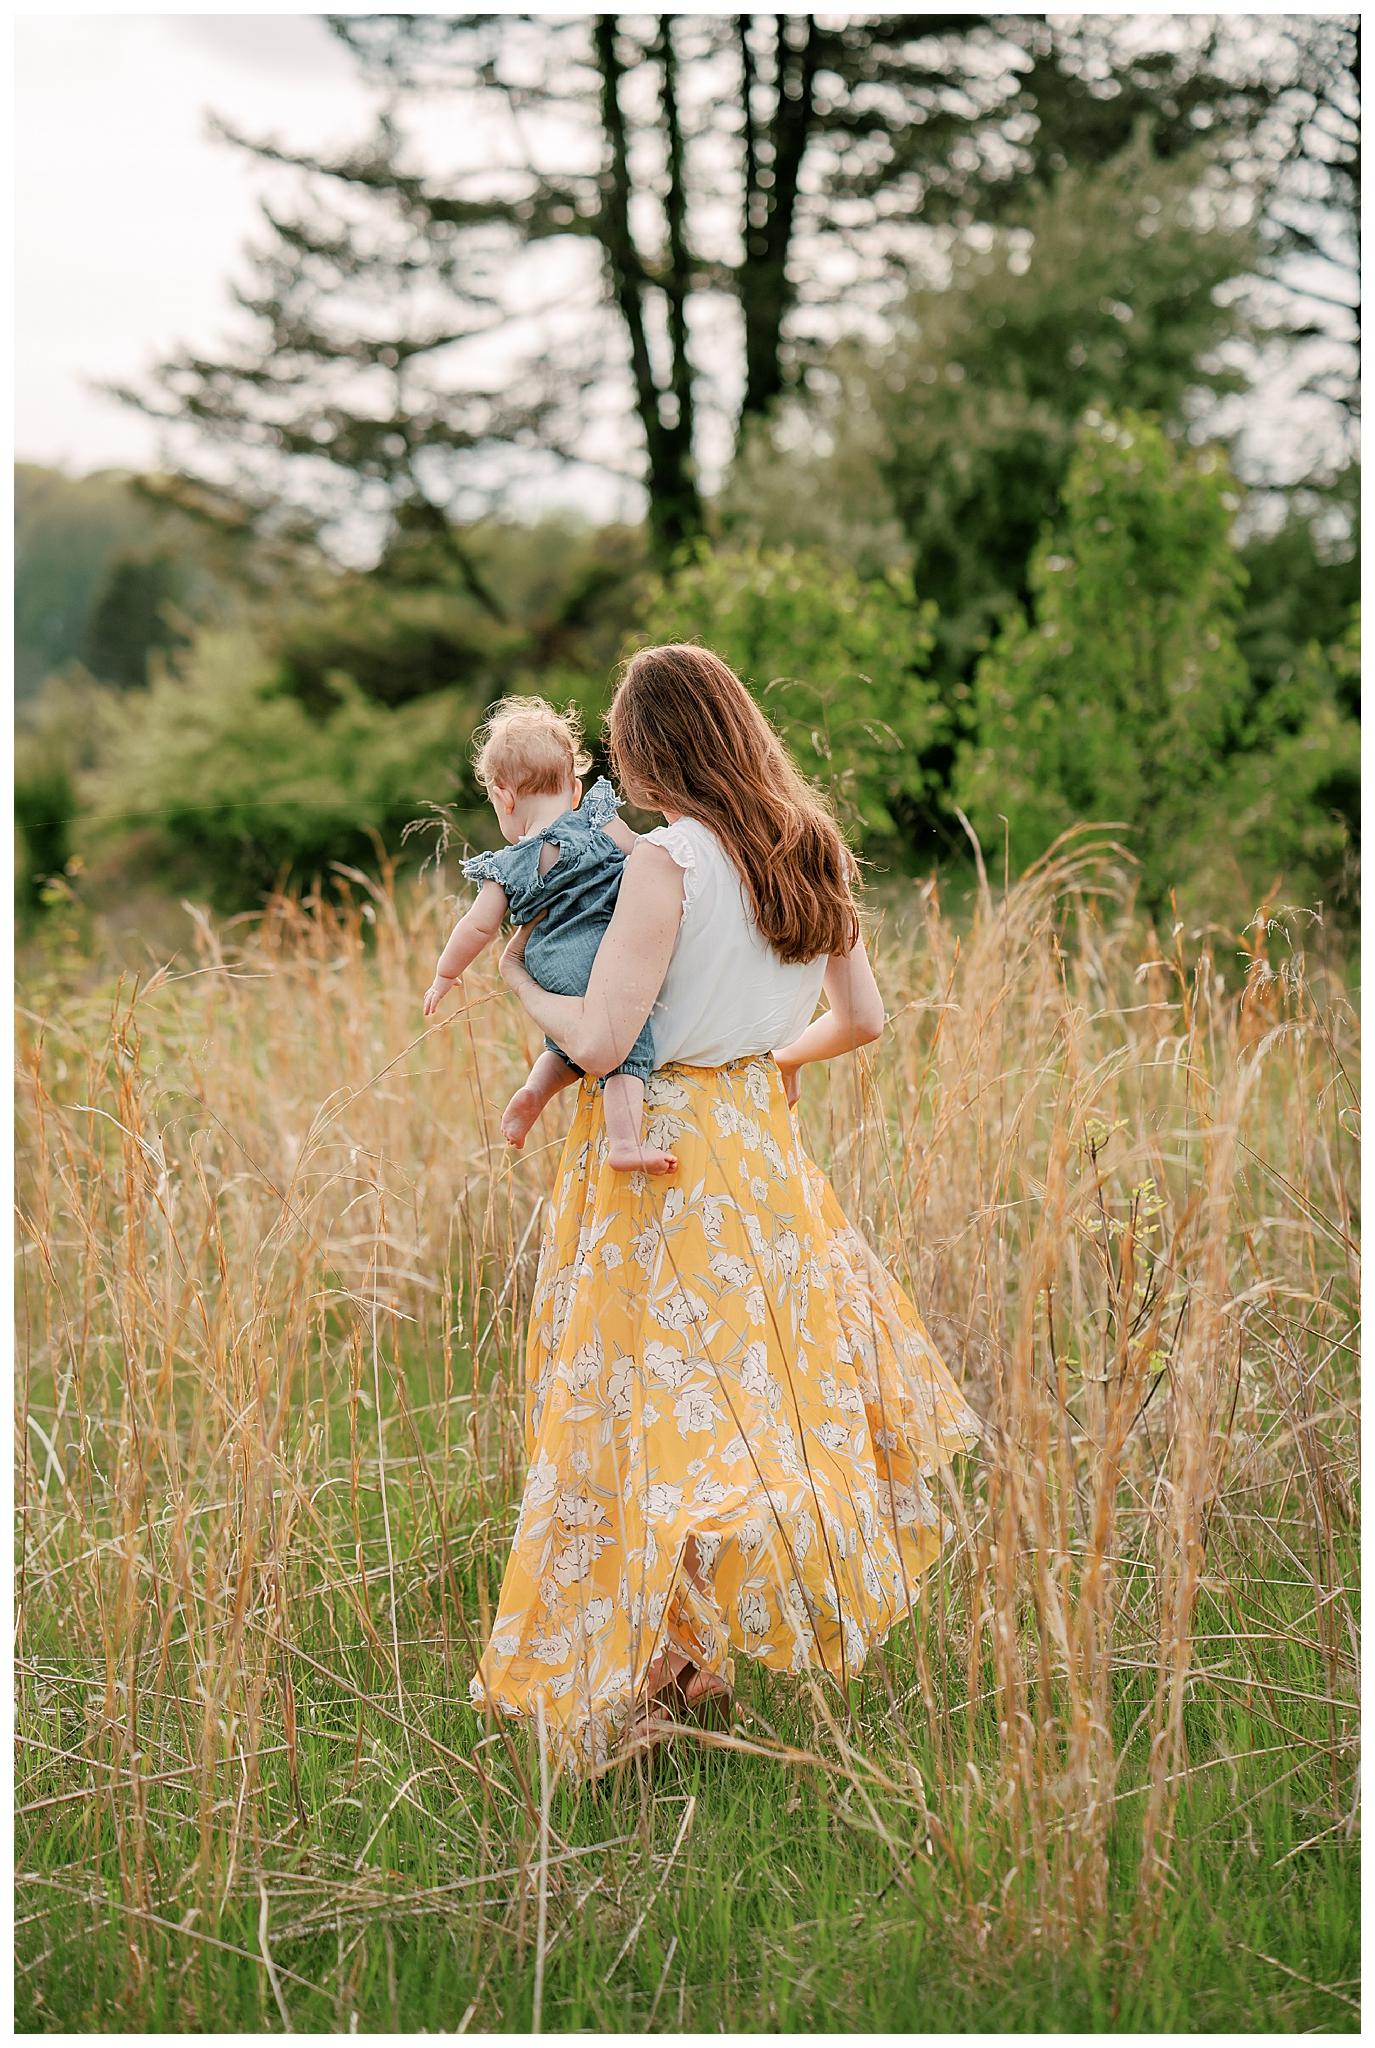 AnneMarie_Hamant_family_photographer_lehigh_valley_pa_0275.jpg